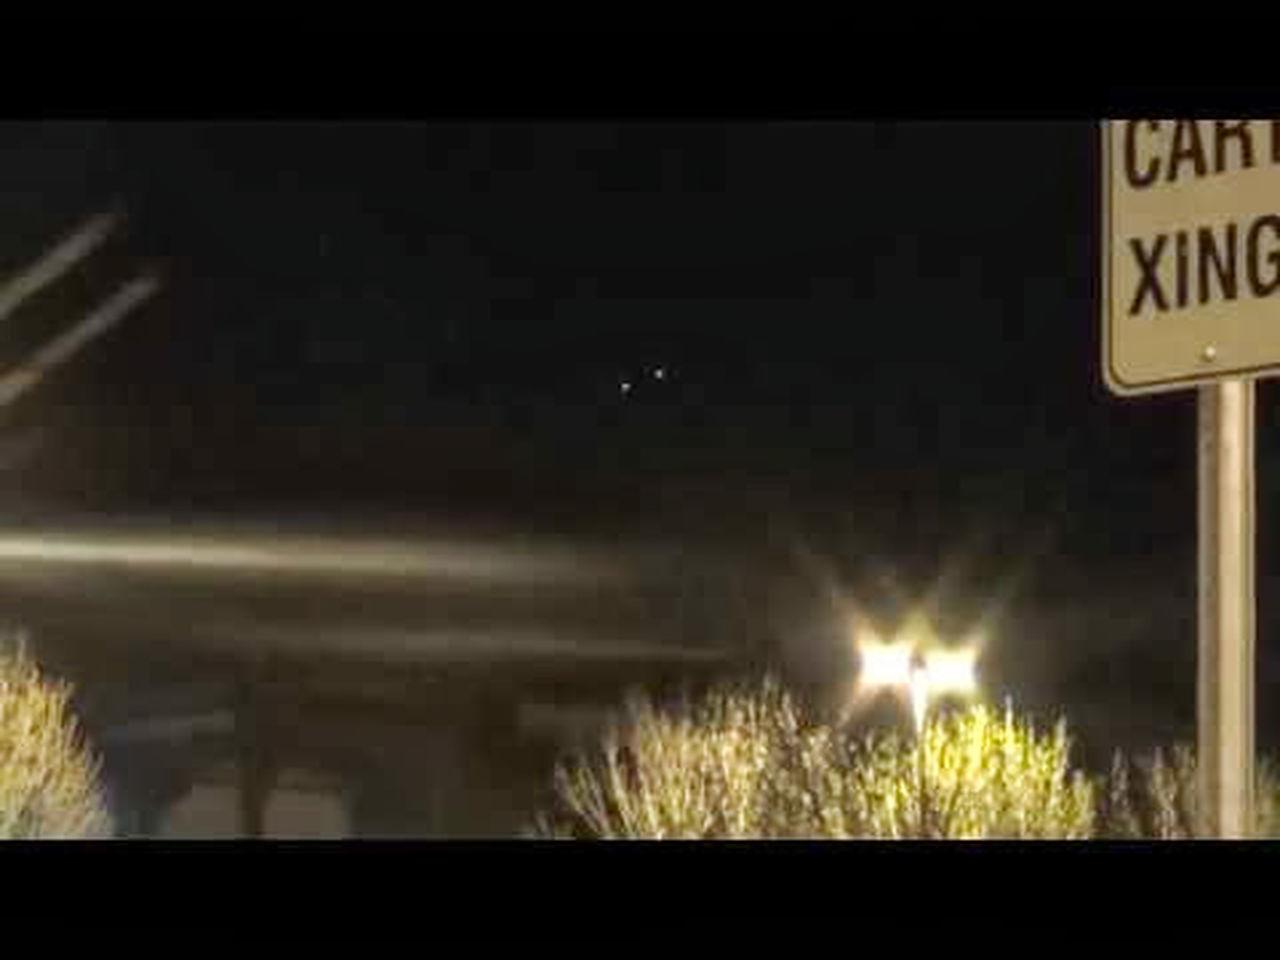 G+ Stalker Ufo There Here Ufo Roxannreyes75.com UFO Sightings Vallejo,ca